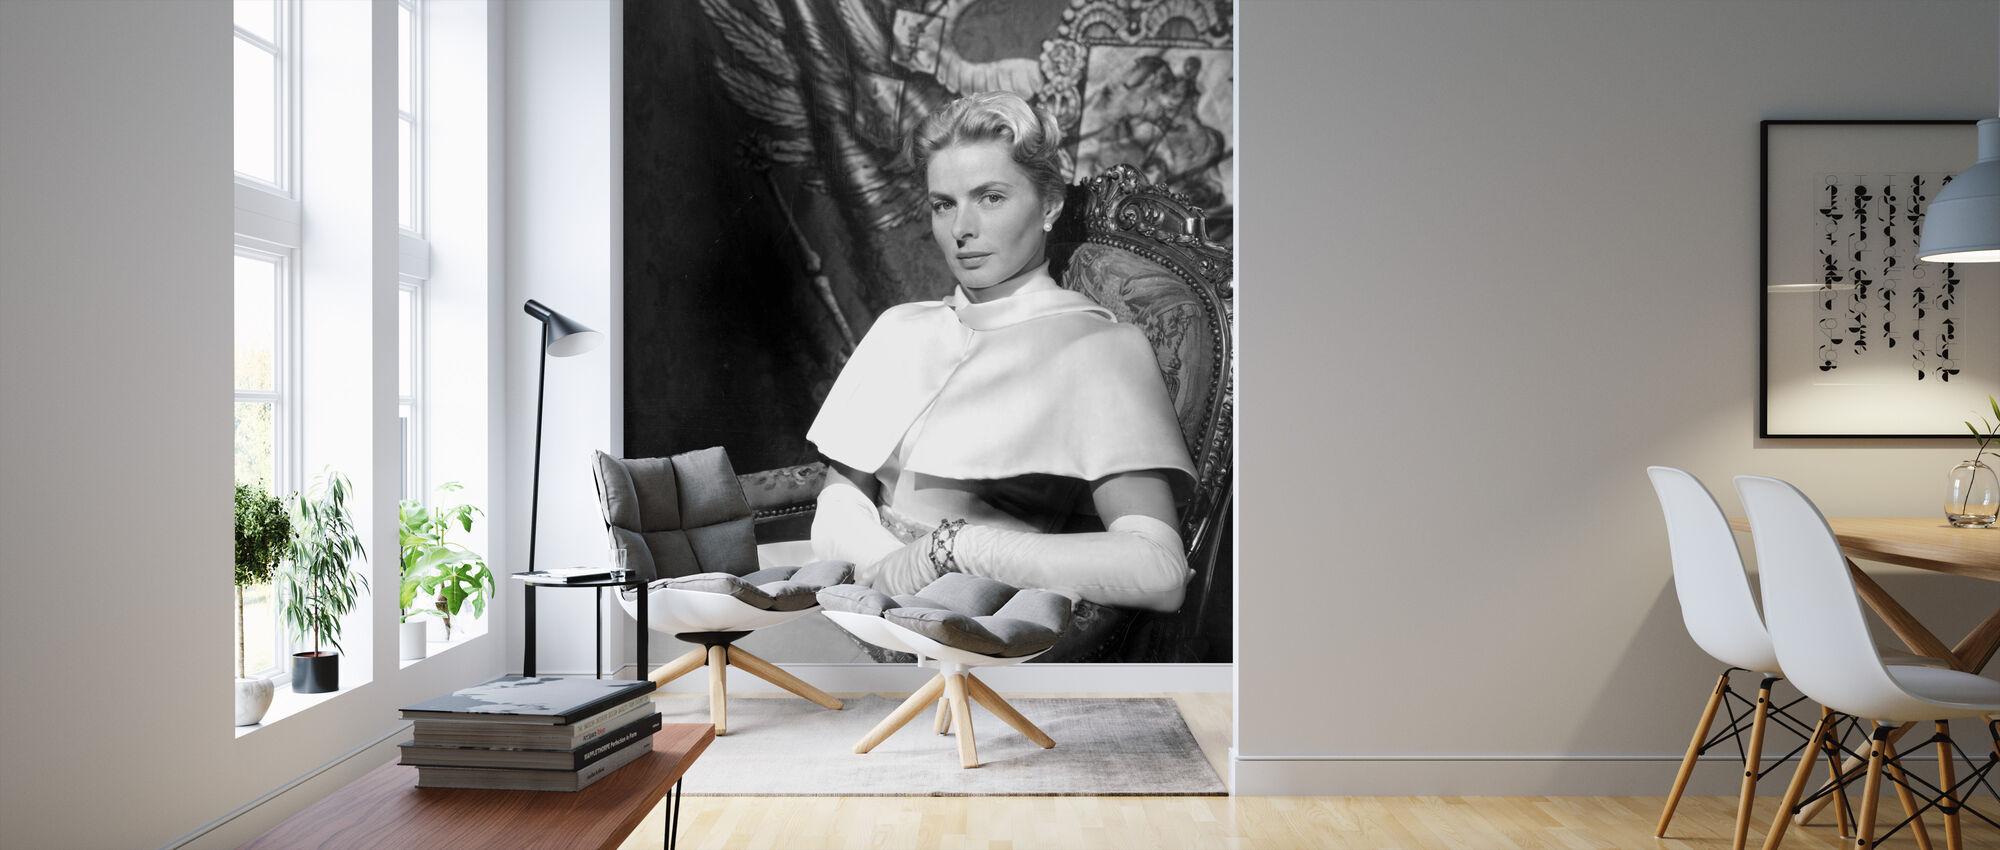 Anastasia 1986 - Wallpaper - Living Room